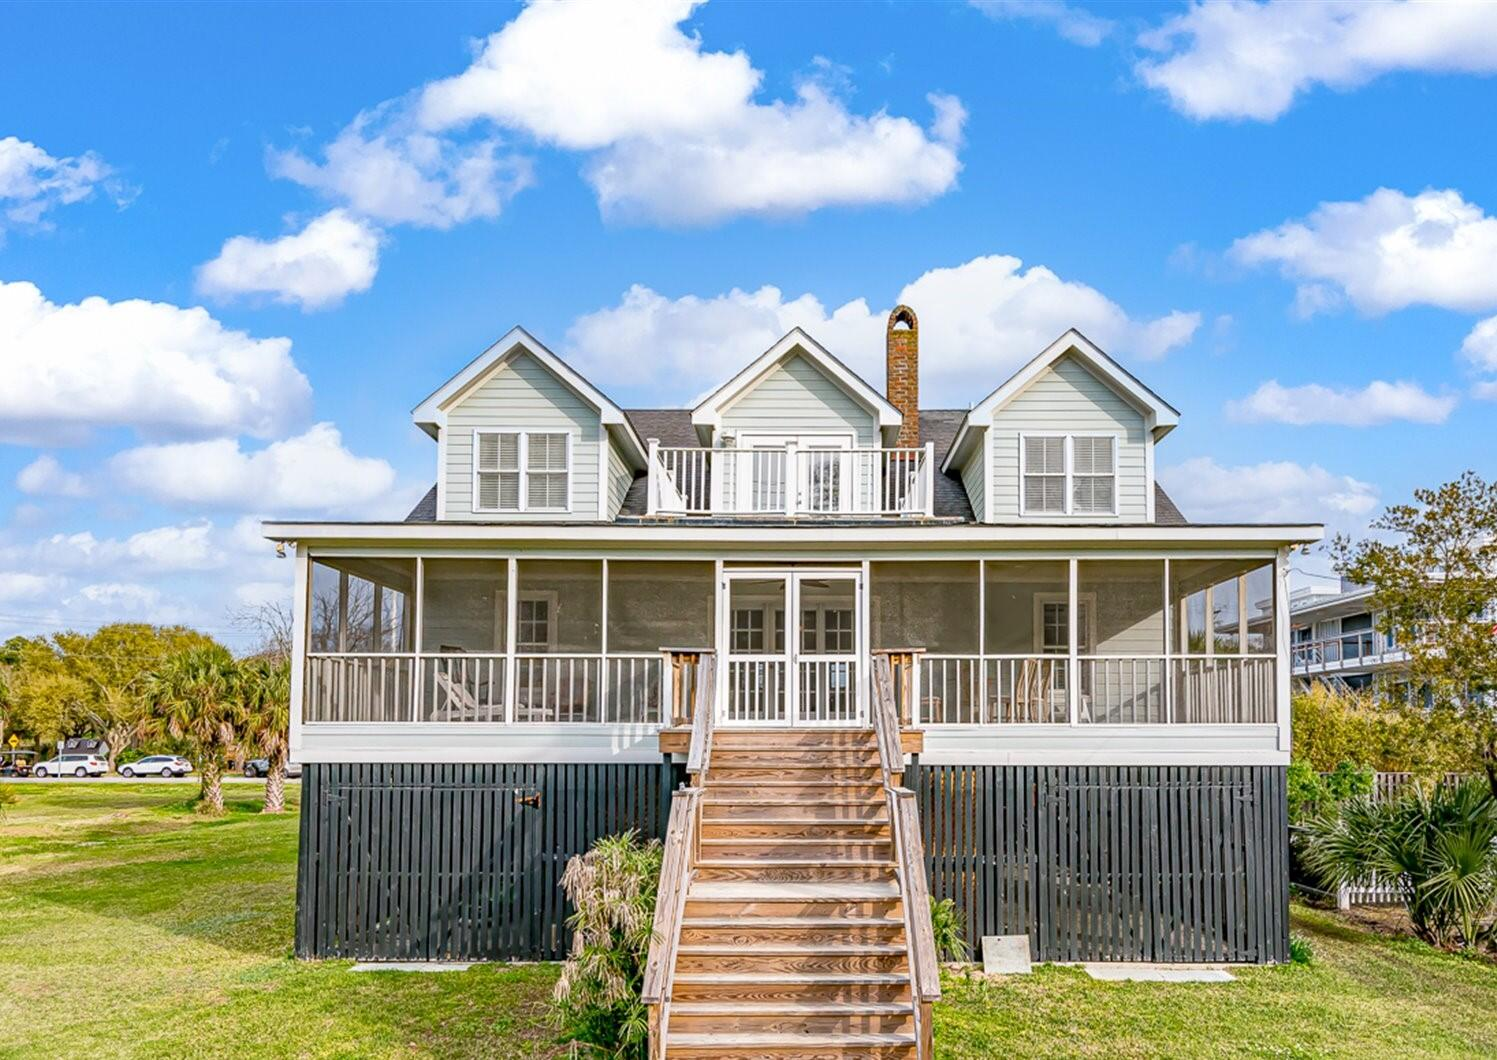 Sullivans Island Homes For Sale - 2107 Middle, Sullivans Island, SC - 23